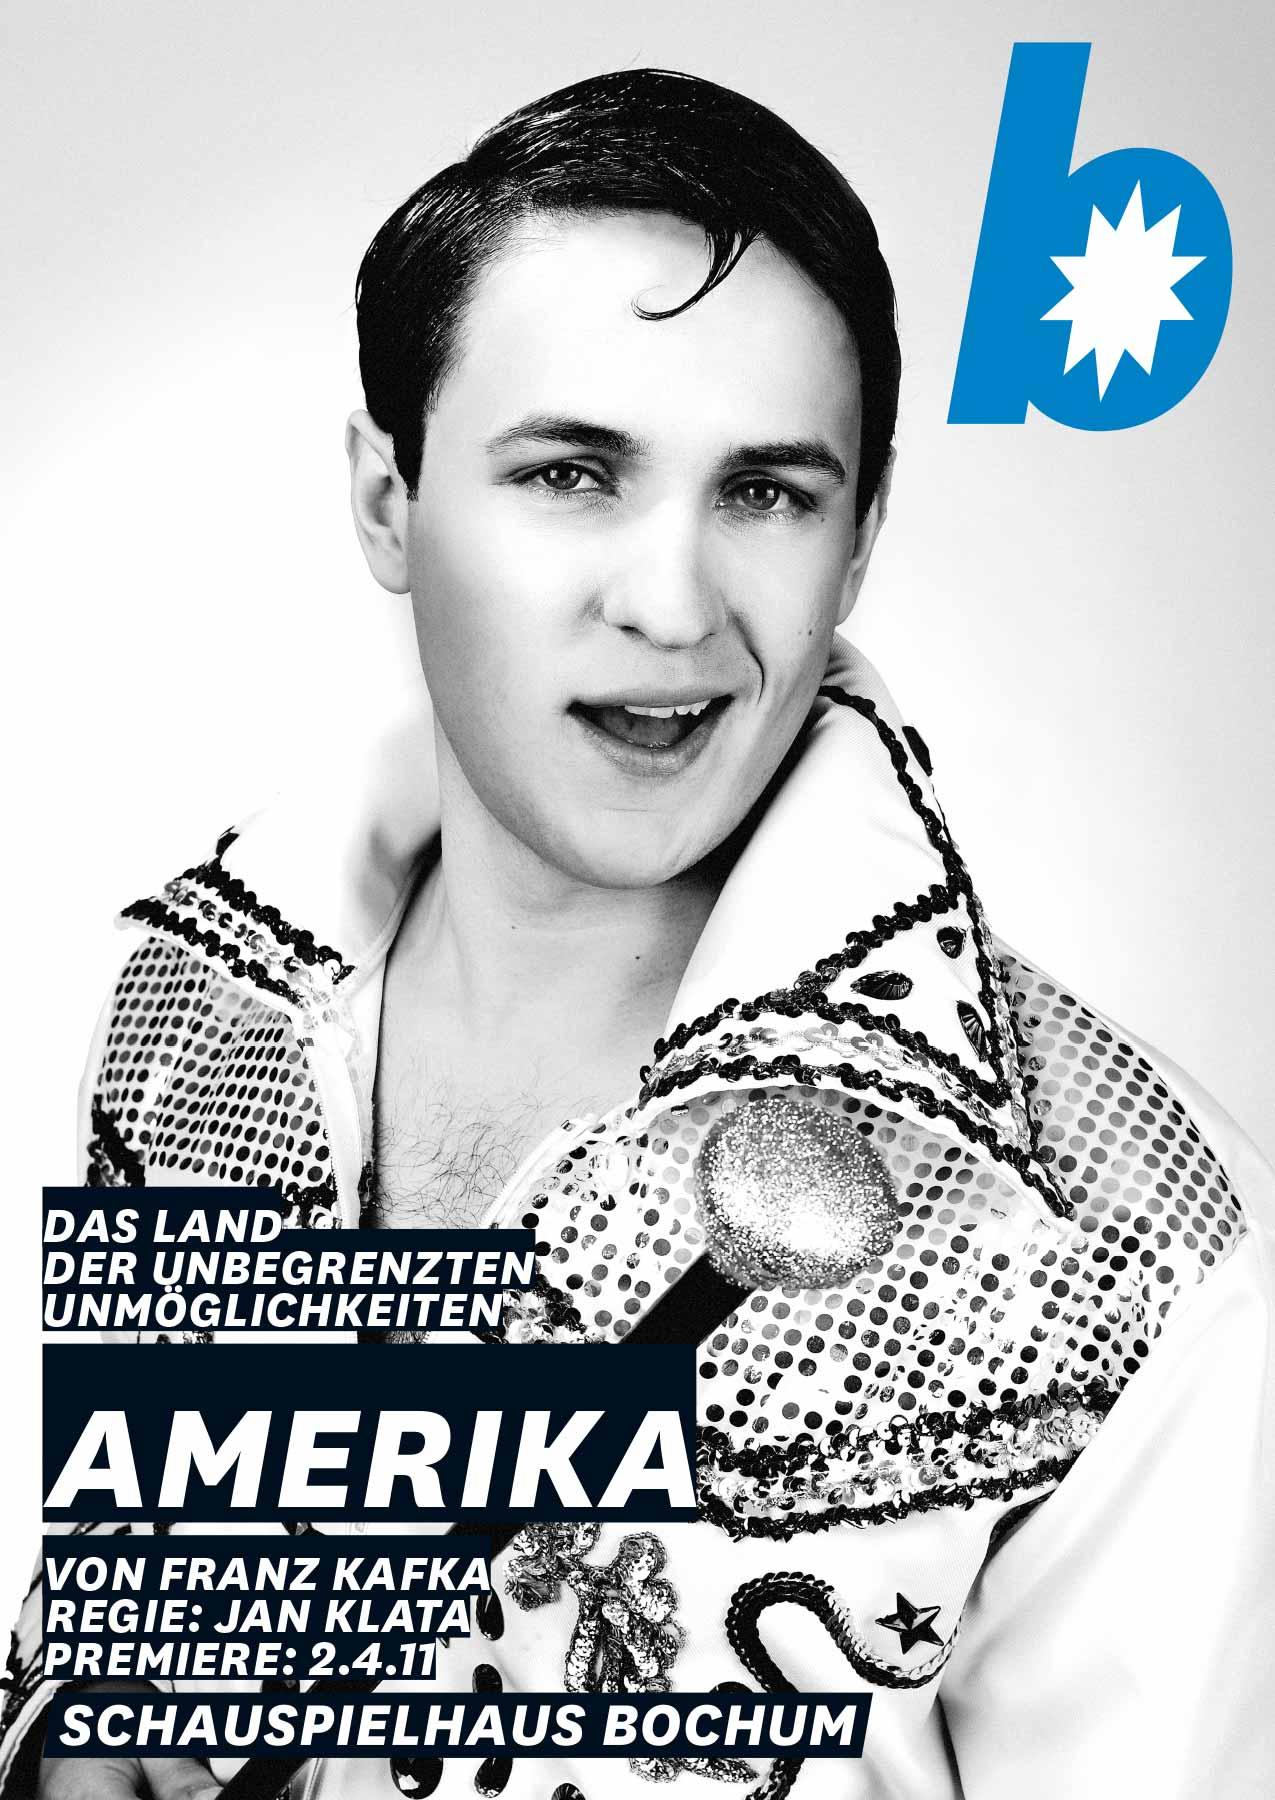 Schauspielhaus Bochum amerika-ucrz-x3